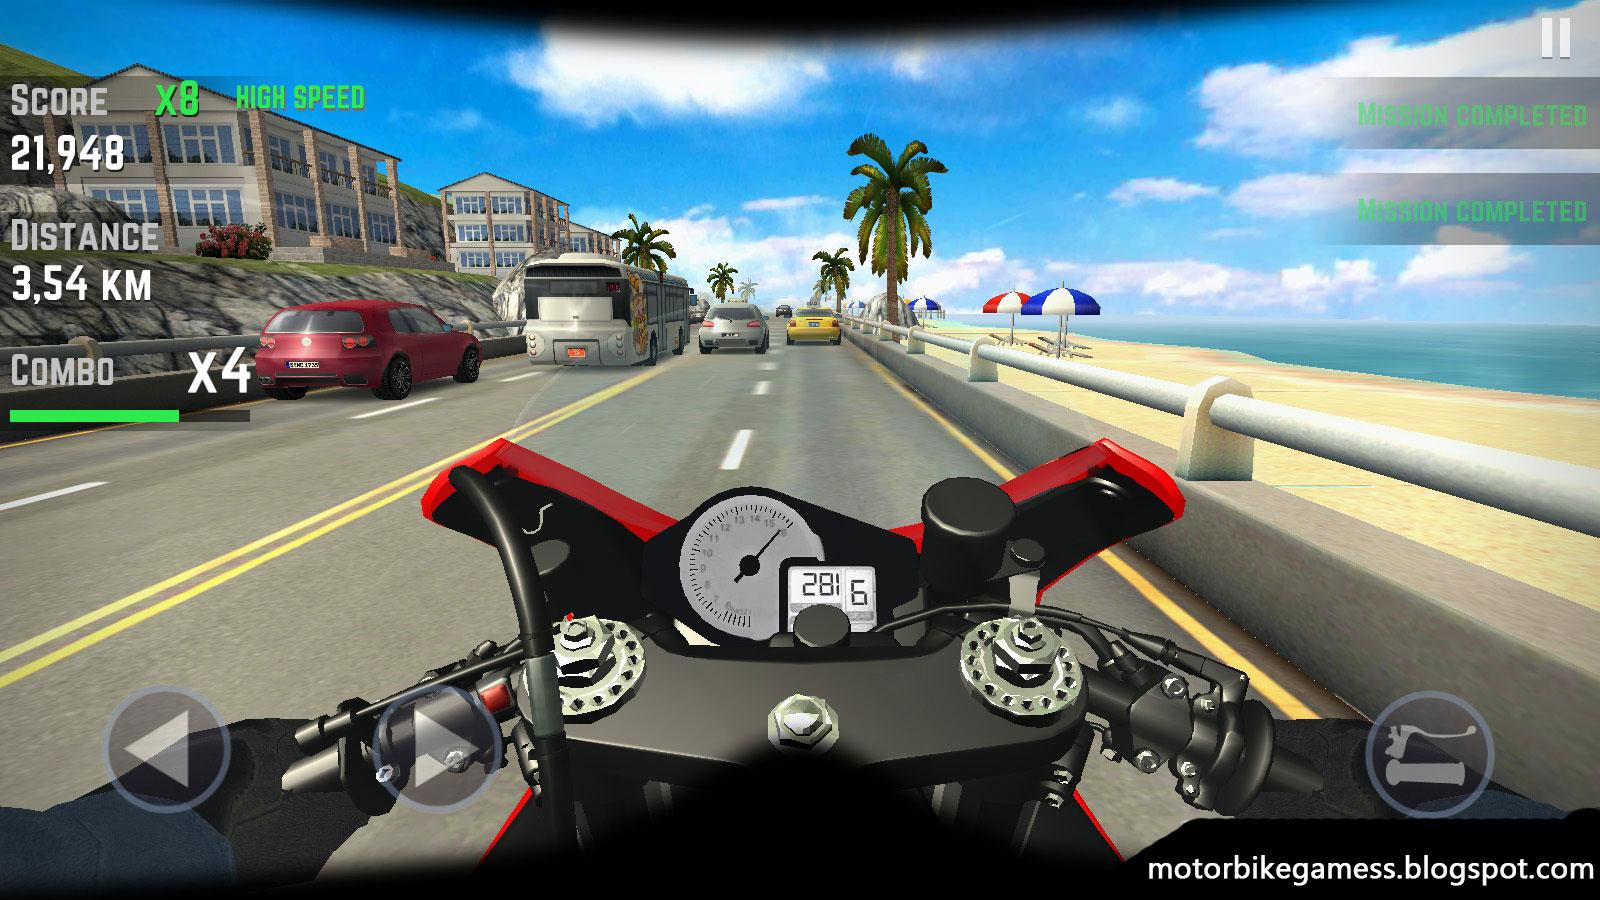 free new motorcycle games  Highway Traffic Rider v1.6 Multiplayer Motorbike Games Free Download ...